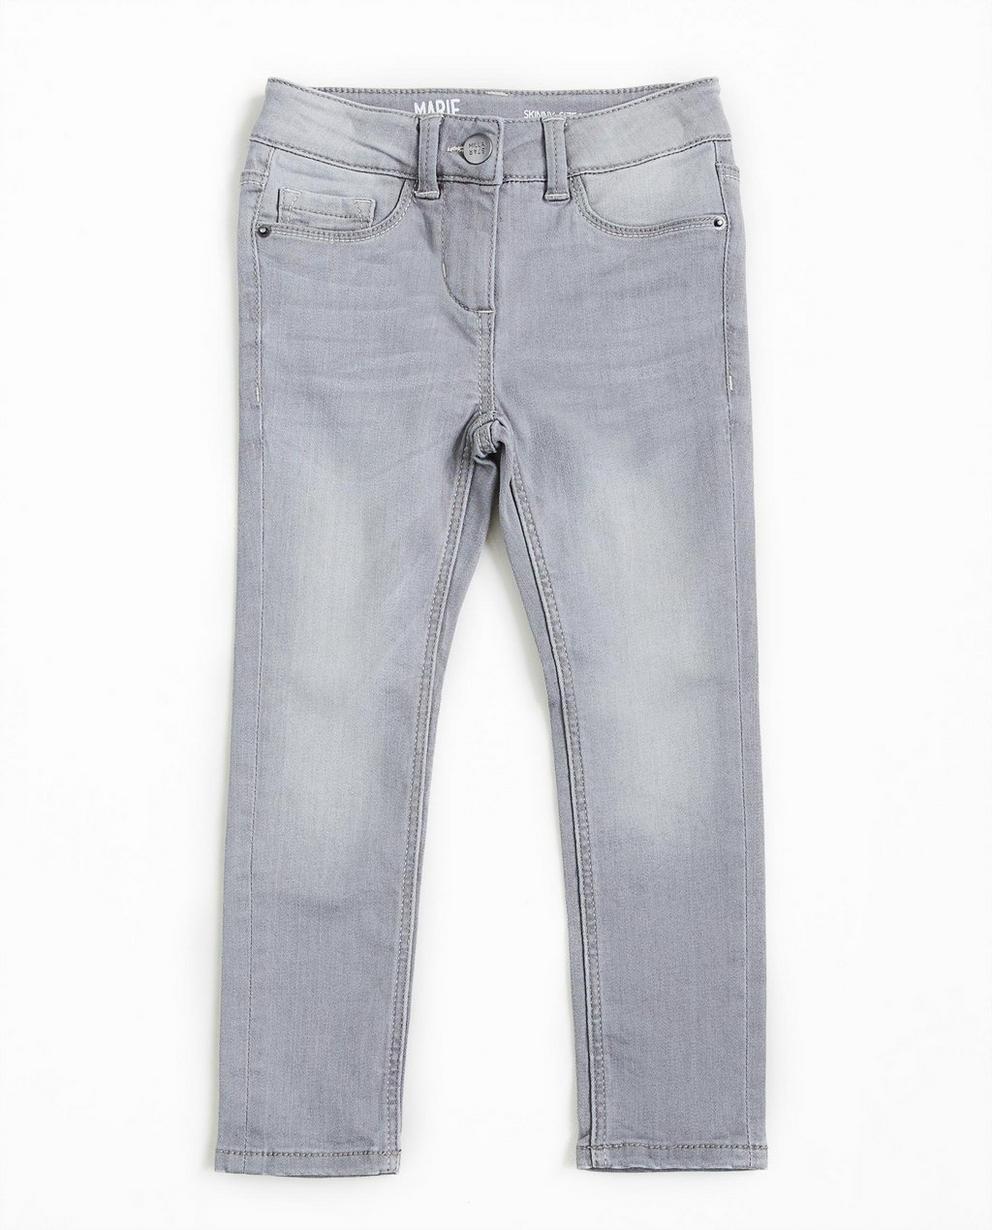 Nachtblaue Jeans - Skinny fit - JBC